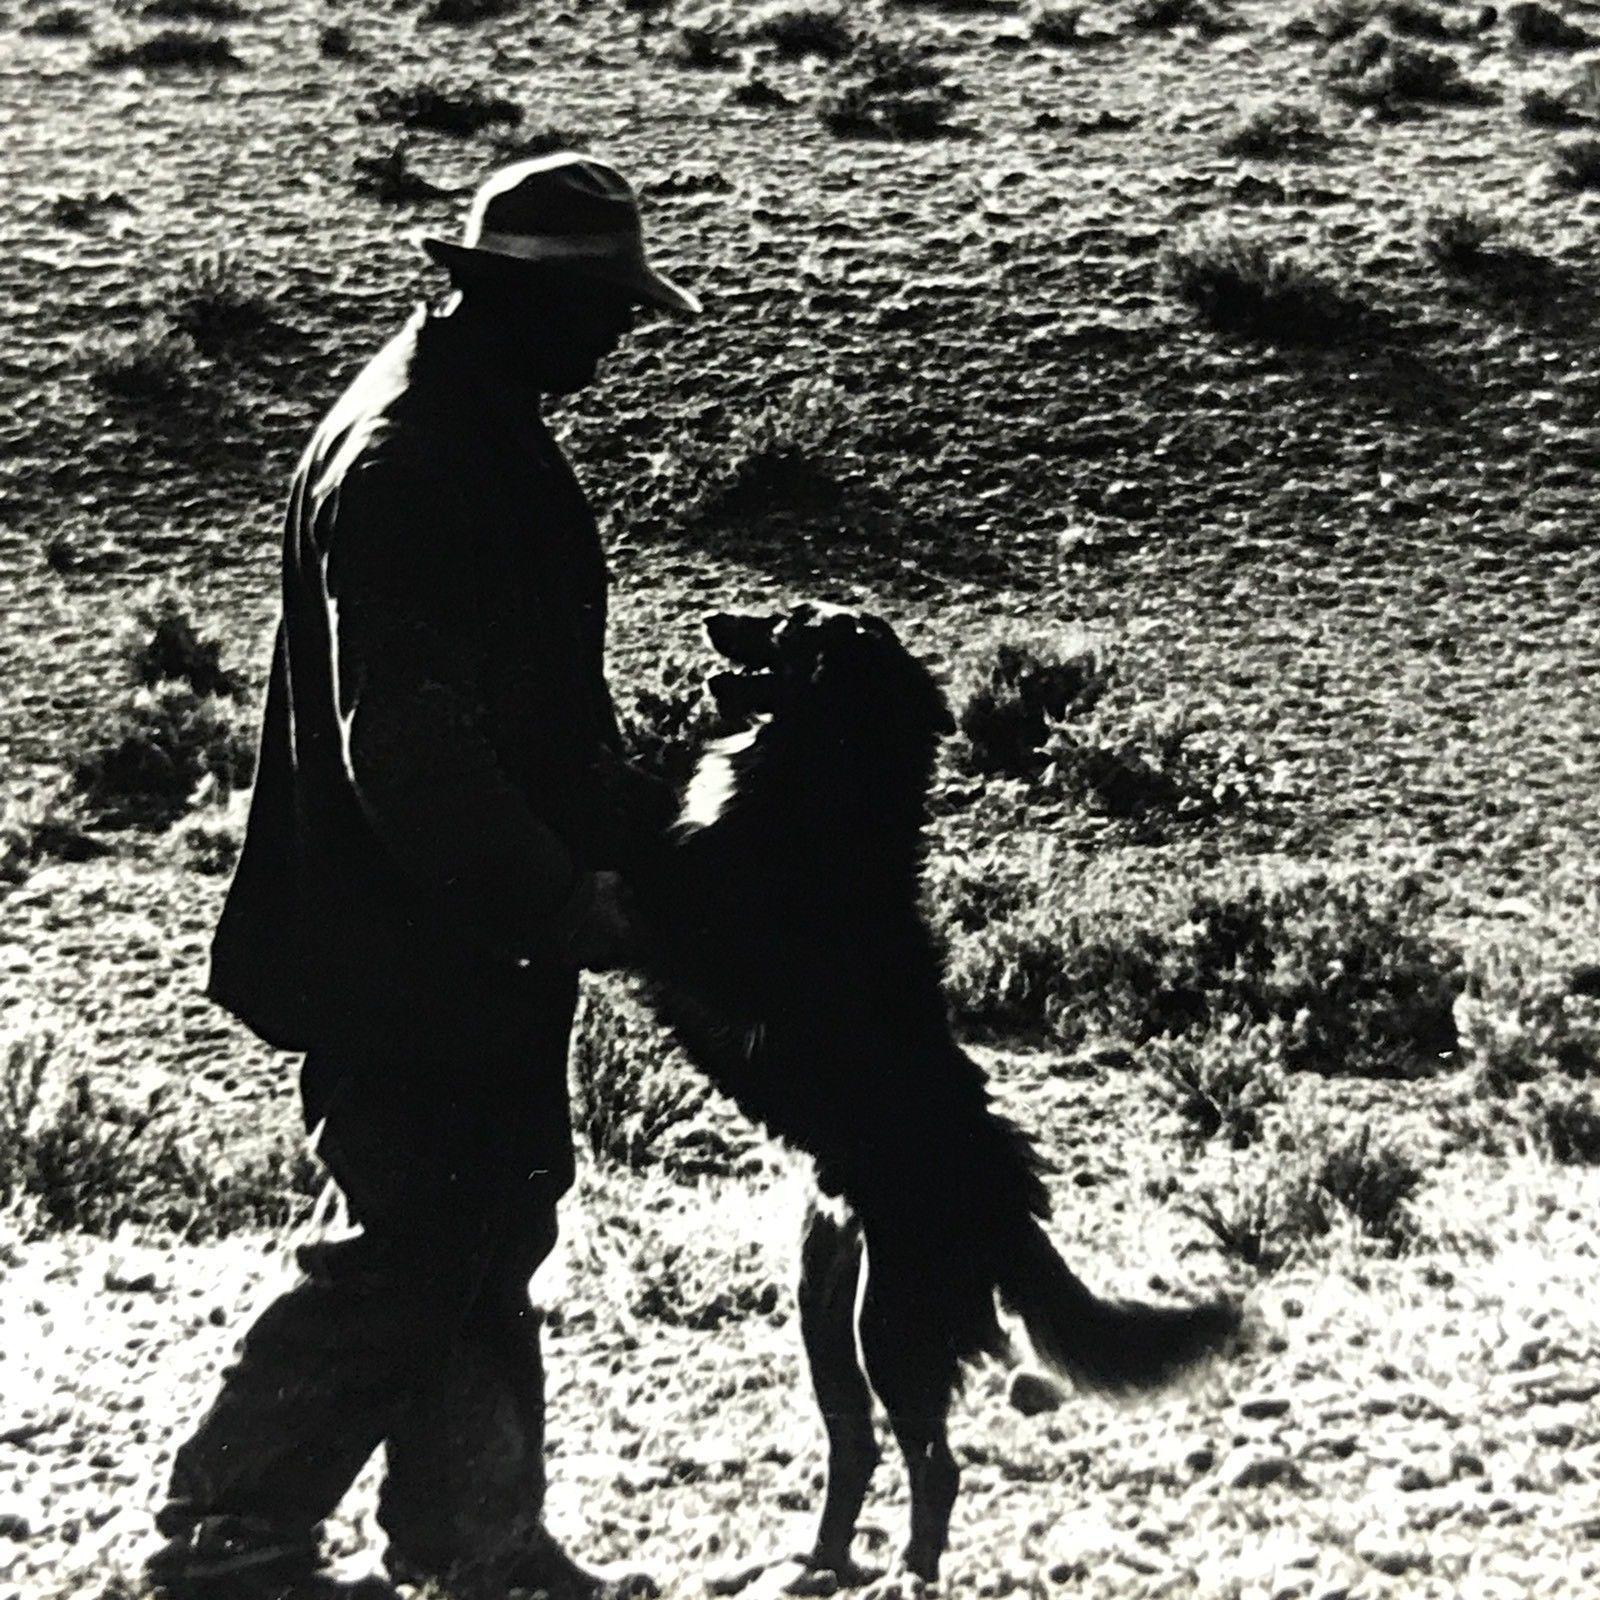 Vtg Magic Lantern Glass Slide Photo Keystone Shepherd And His Dog Idaho Sheep